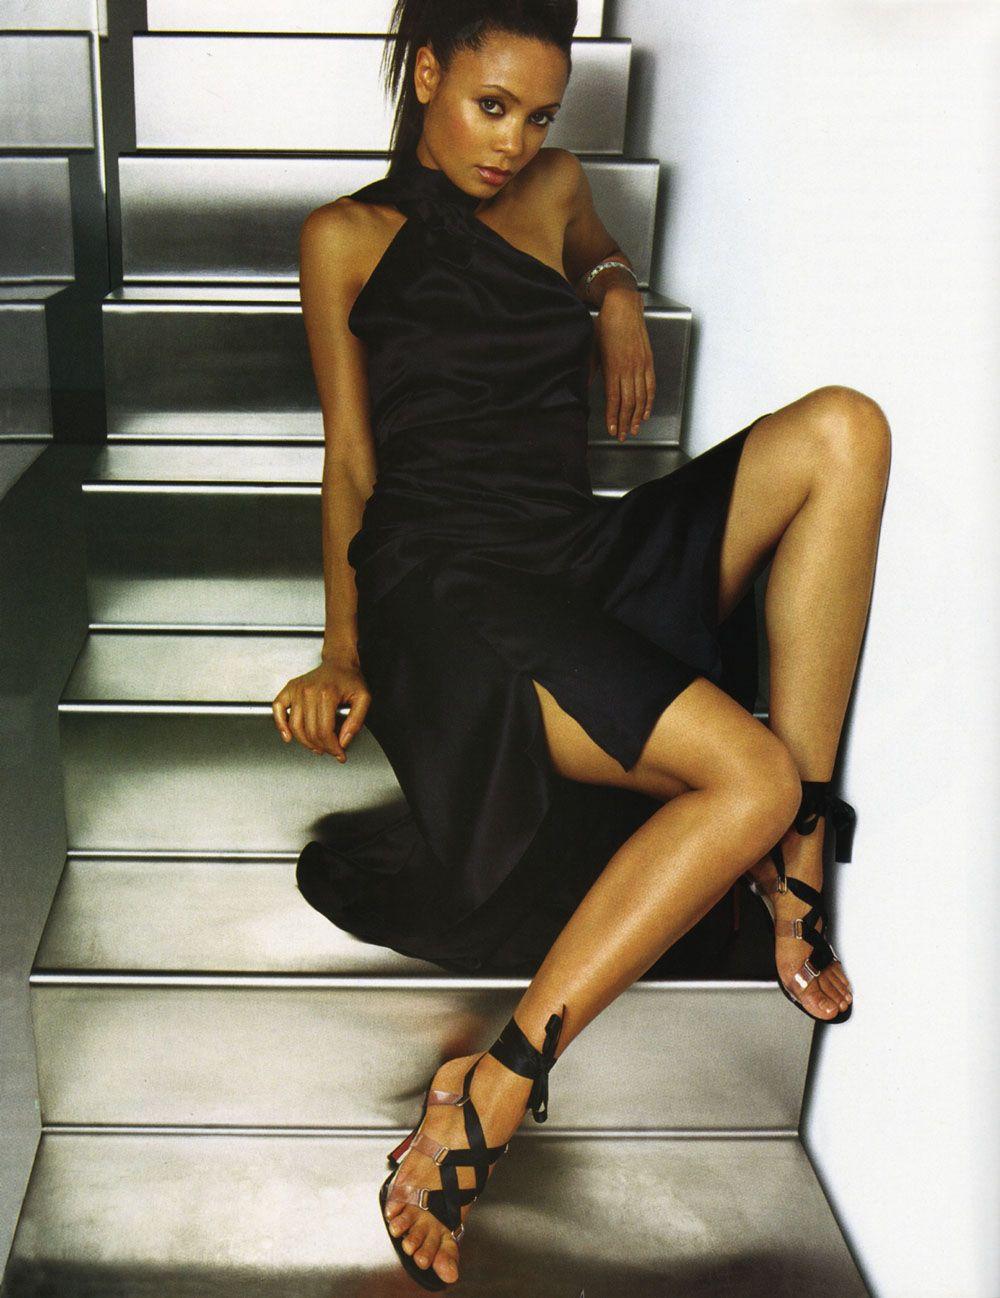 charmaine sinclair | c.lebbre.t&a | pinterest | charmaine sinclair